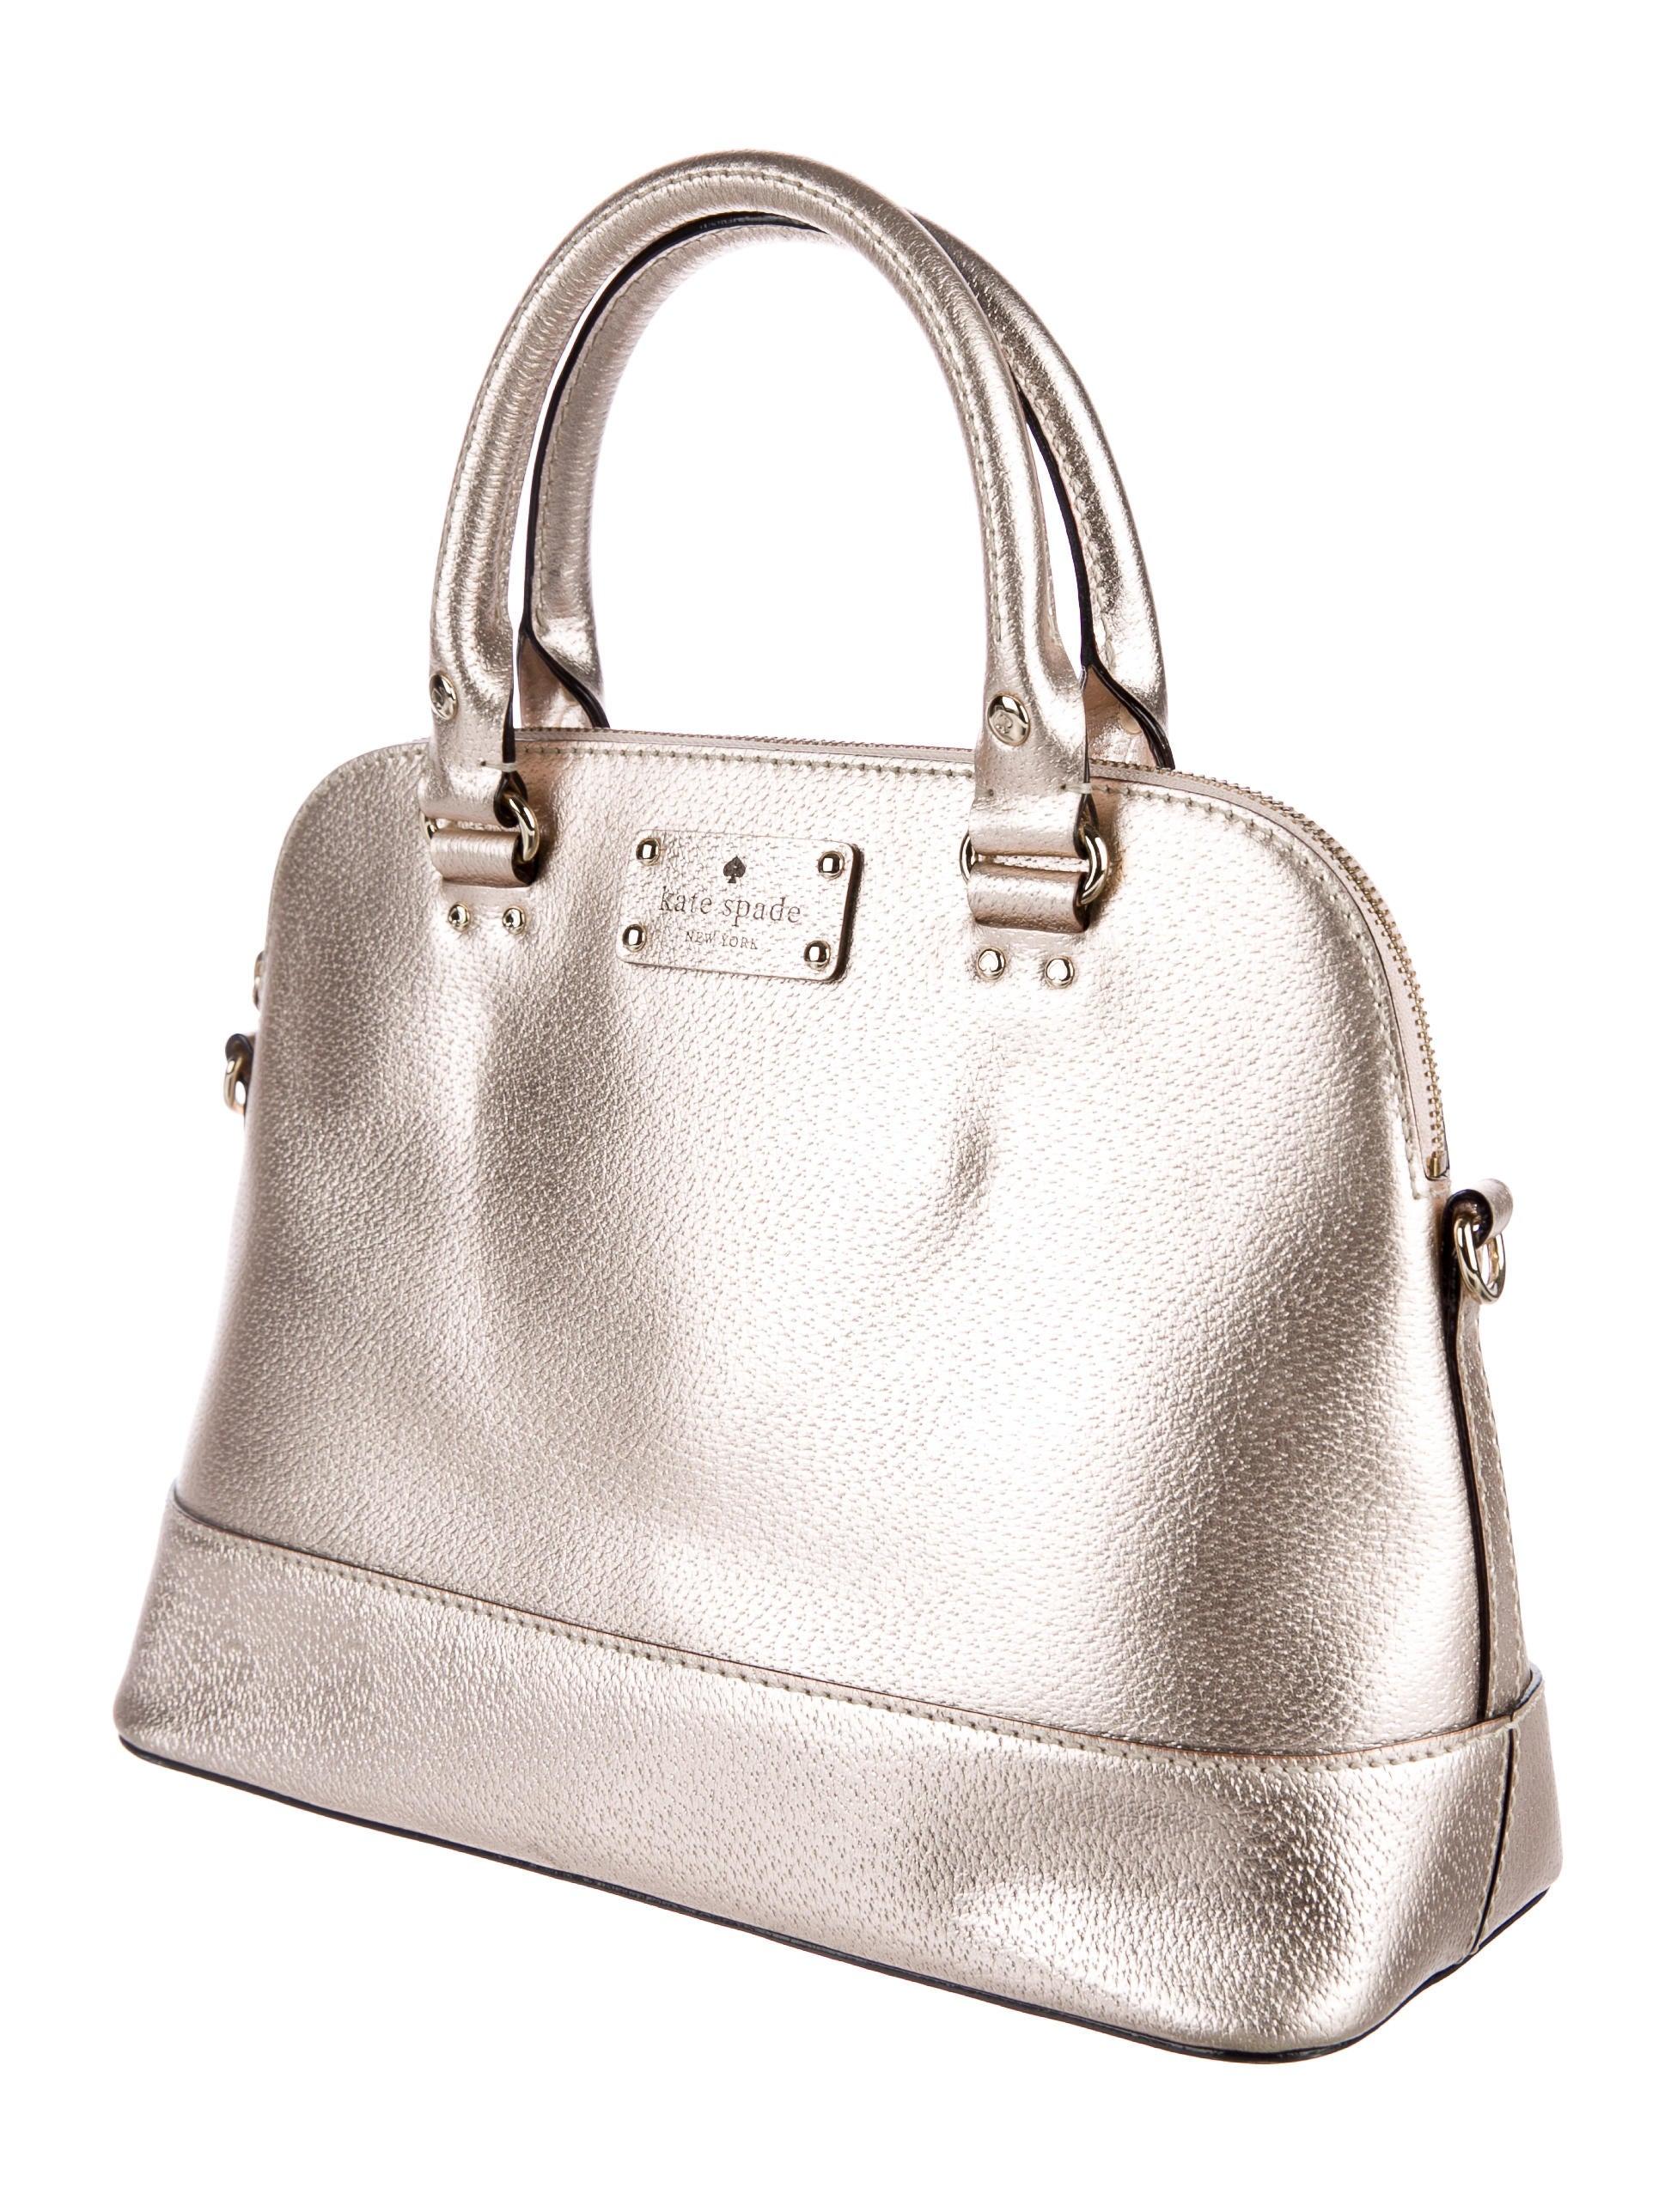 Kate Spade New York Wellesley Small Rachelle Satchel Handbags Katespade